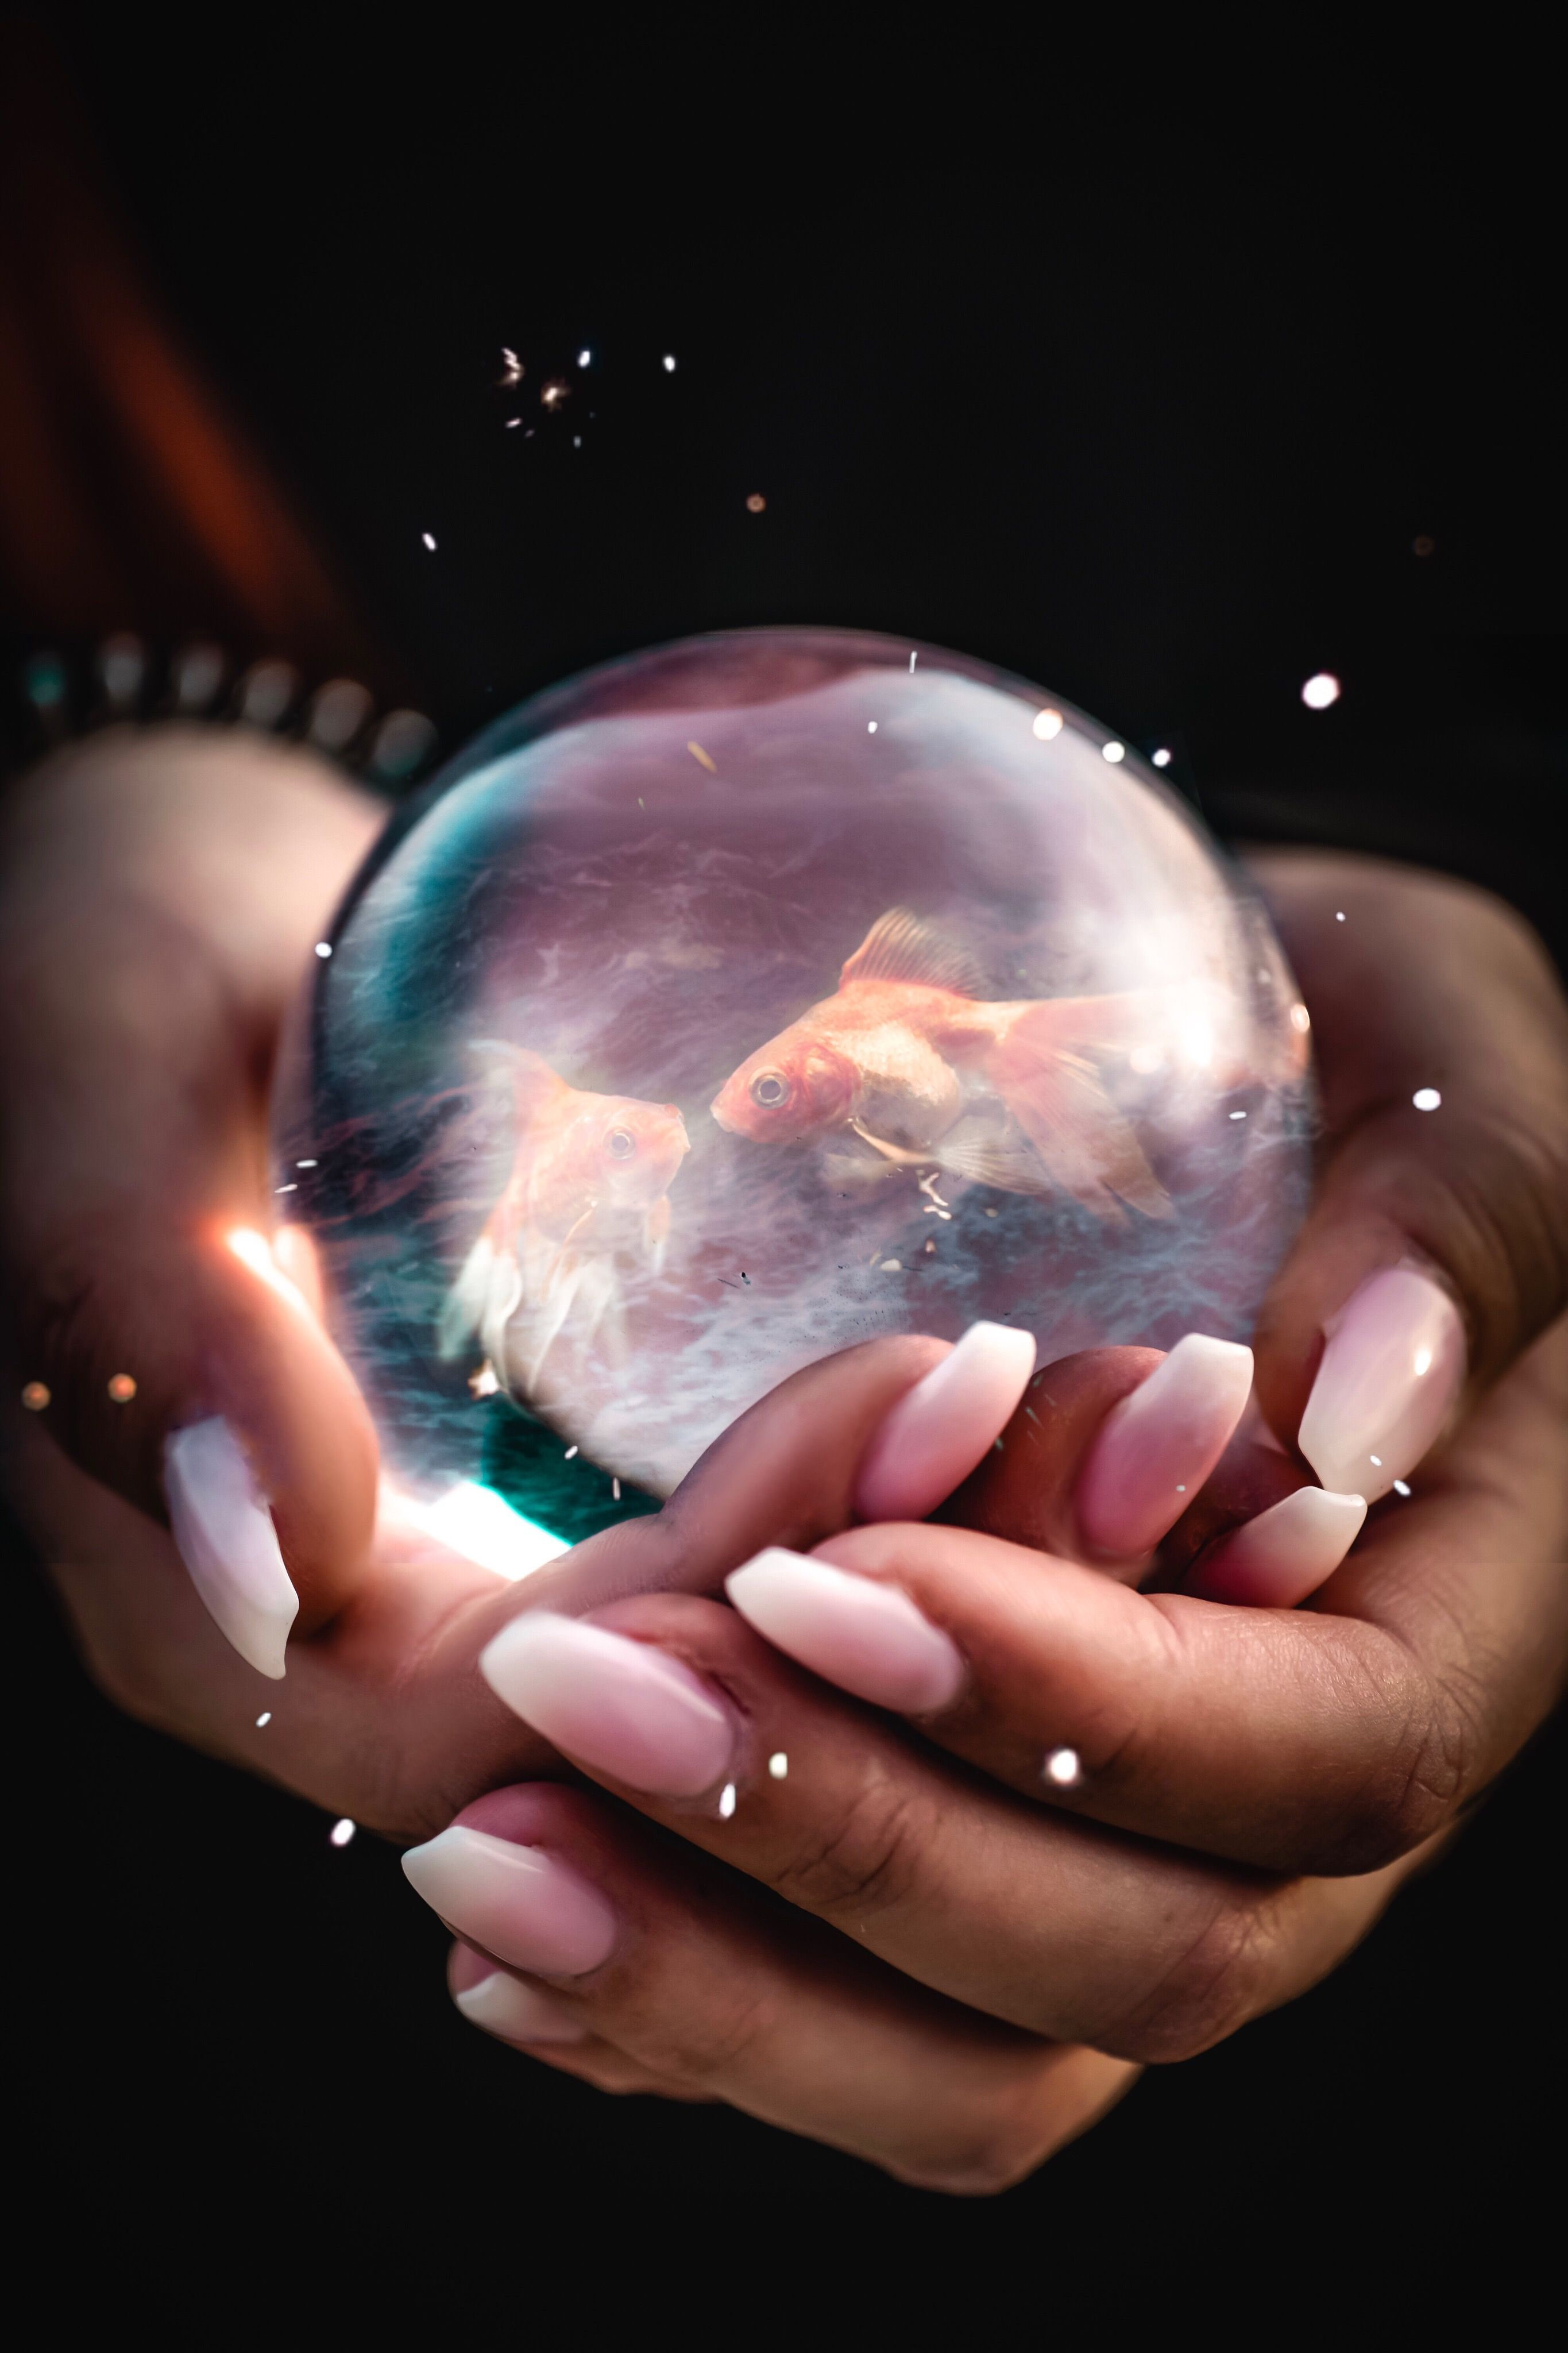 lovely world ✨  #freetoedit #interesting #interesting #nature #fish #people #sky #photography #lensball #lensballfun #lensballphotography #moodyports #moodygrams #glitter #bokeh #lights #lifestyle #world #worldshotz #earth